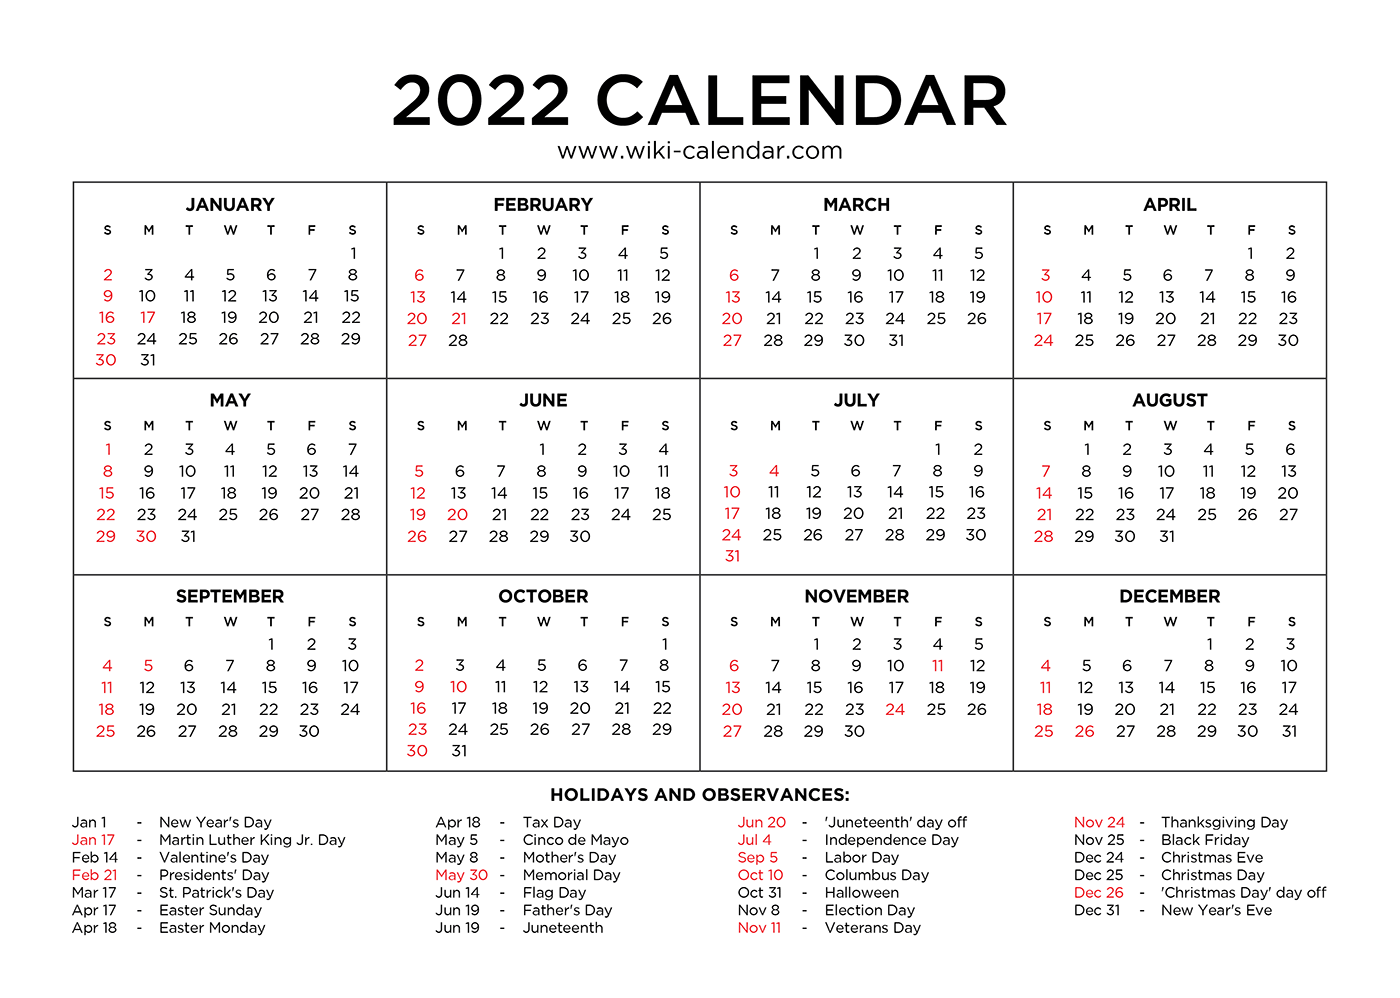 Year 2022 Calendar